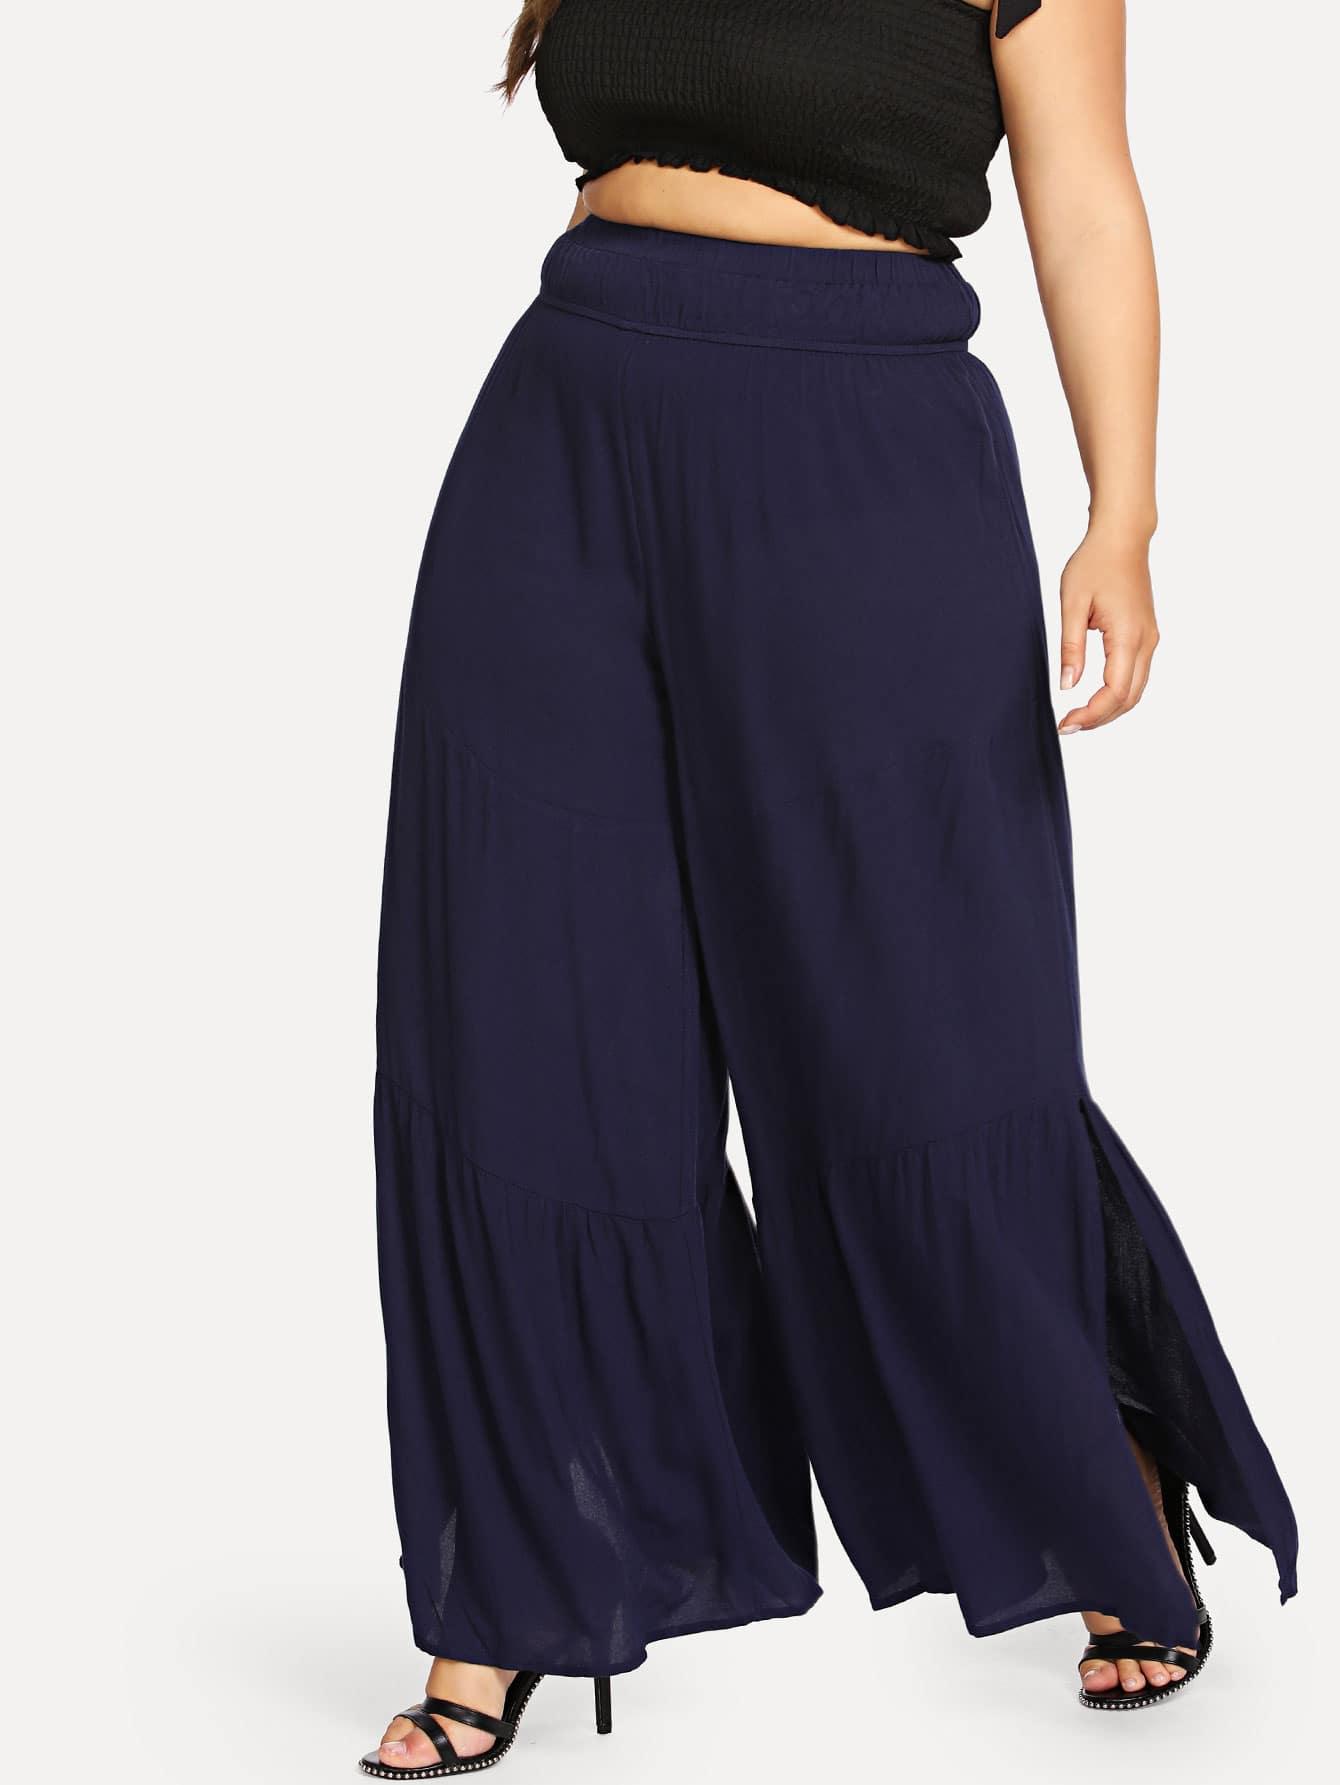 Wide Waistband Ruffle Wide Leg Pants buttoned wide waistband palazzo pants with strap